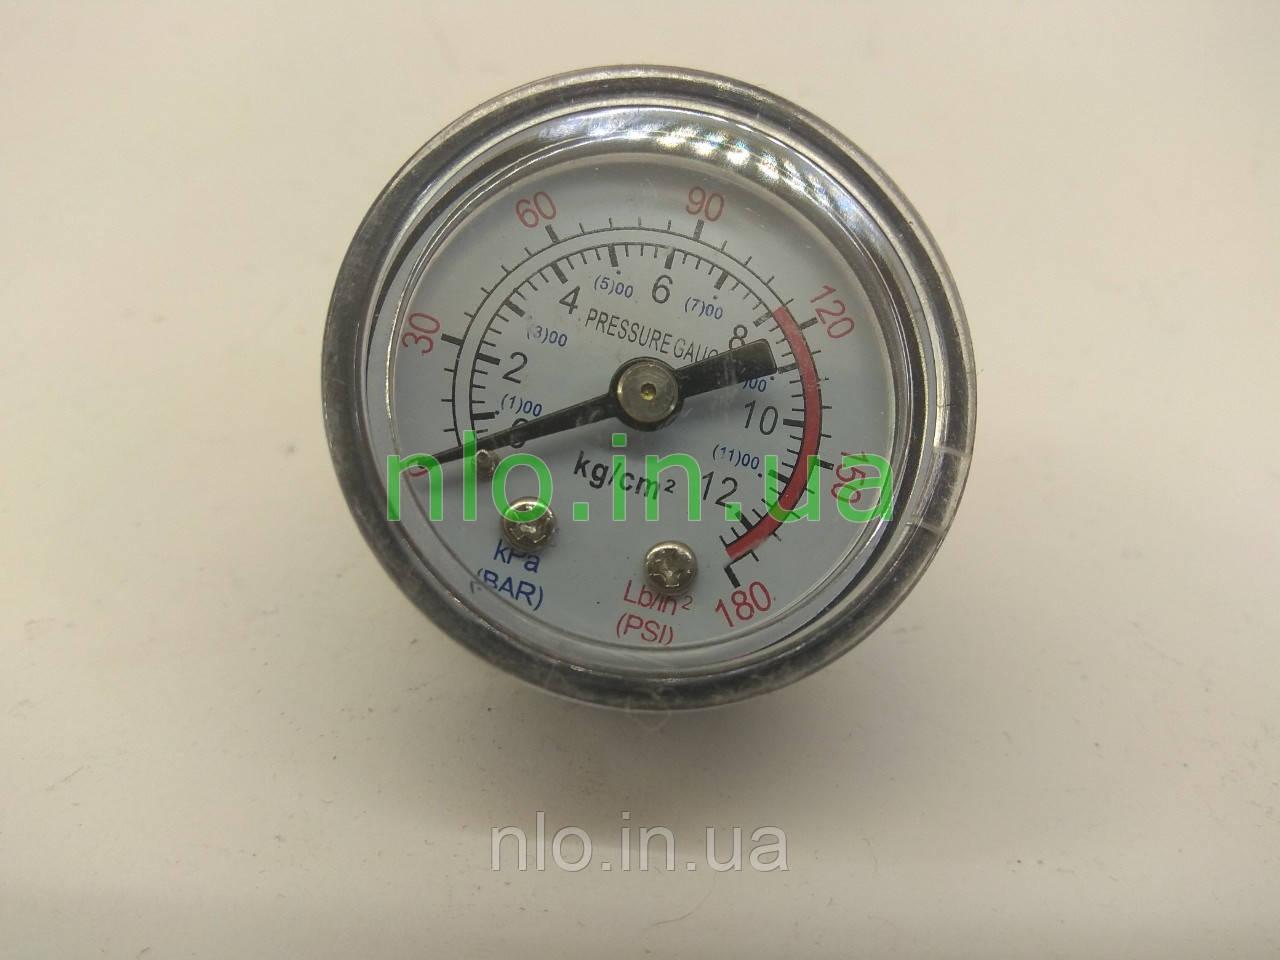 Манометр компрессора (резьба 9,5 мм, габарит 40х39 мм)